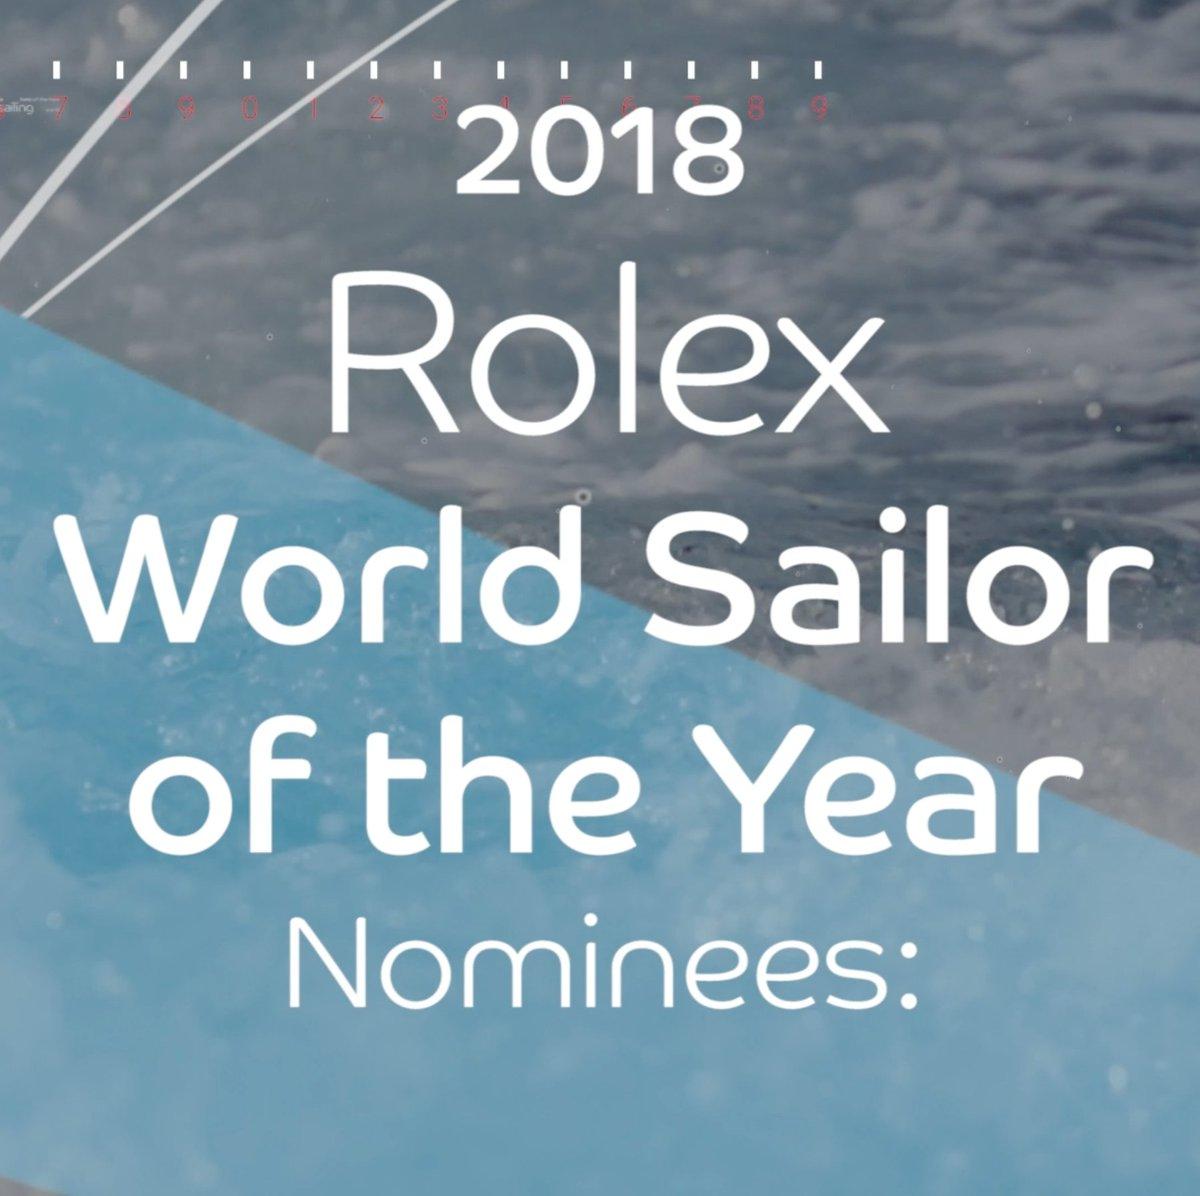 2018 Formula Kiteboarding World Champion Daniela Mororz 🇺🇸 is a finalist for the Rolex World Sailor of the Year Award. ⌚️🏆